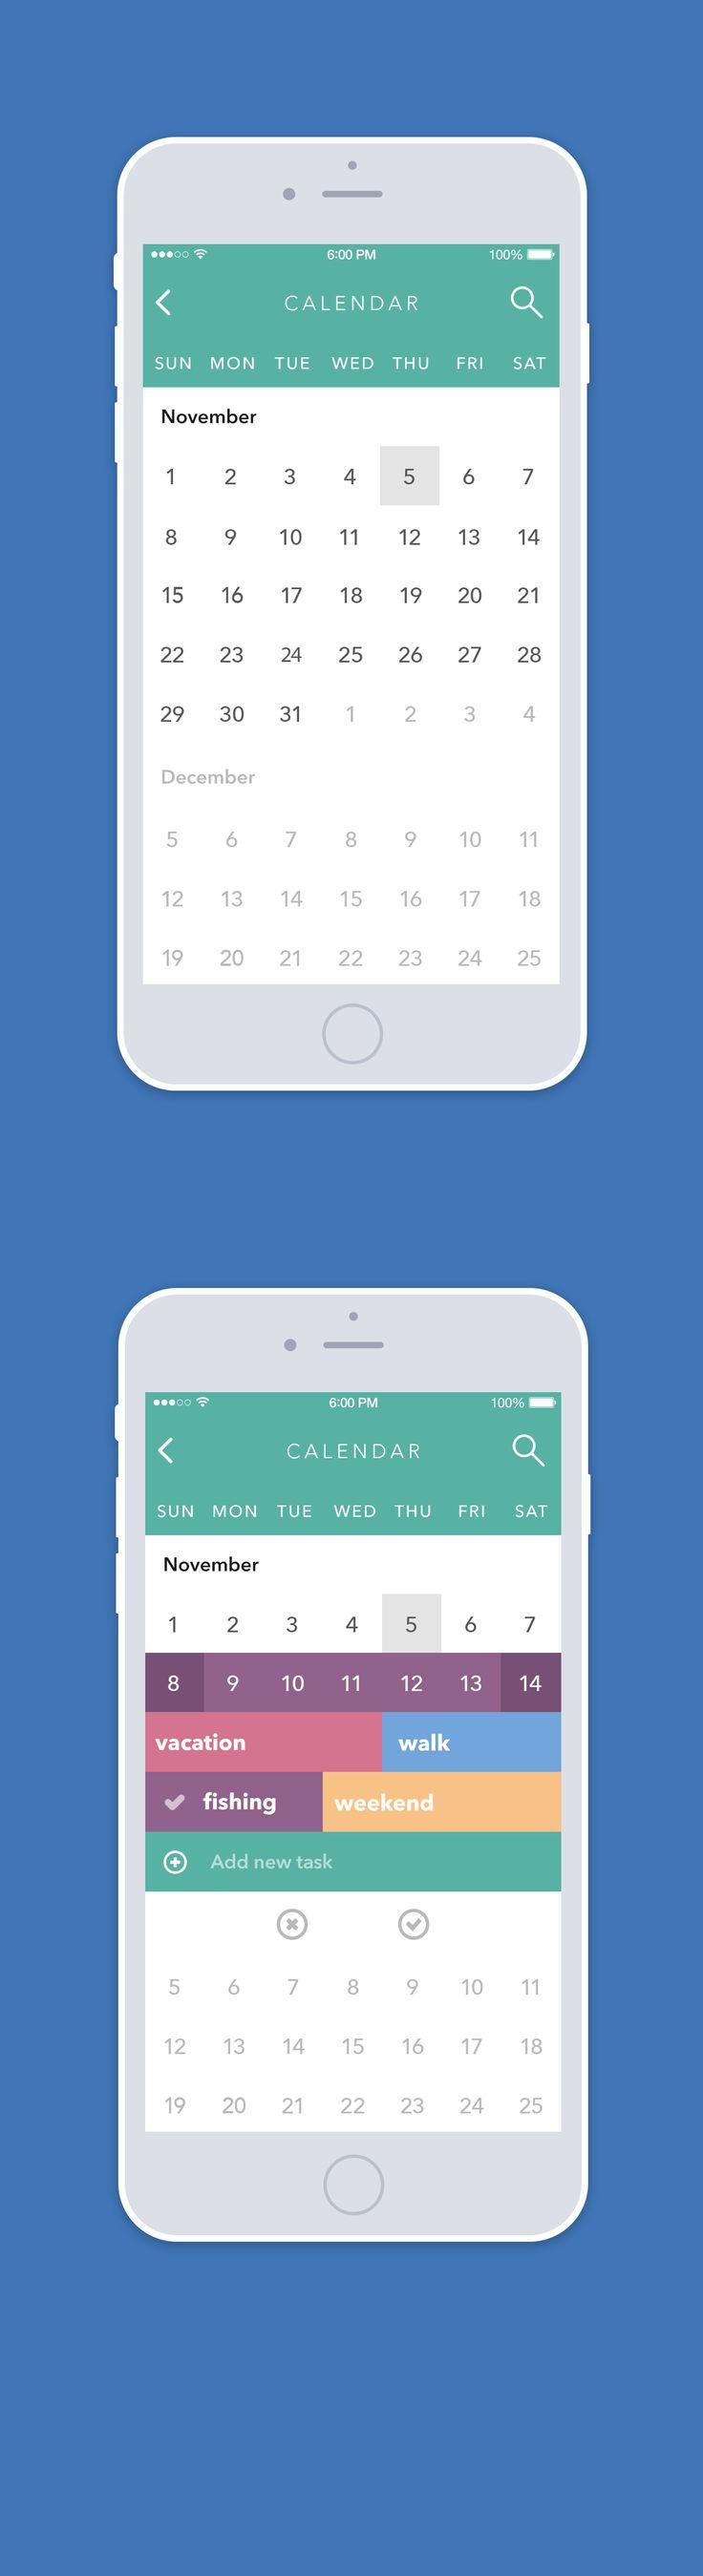 Calendar by Sergey Valiukh